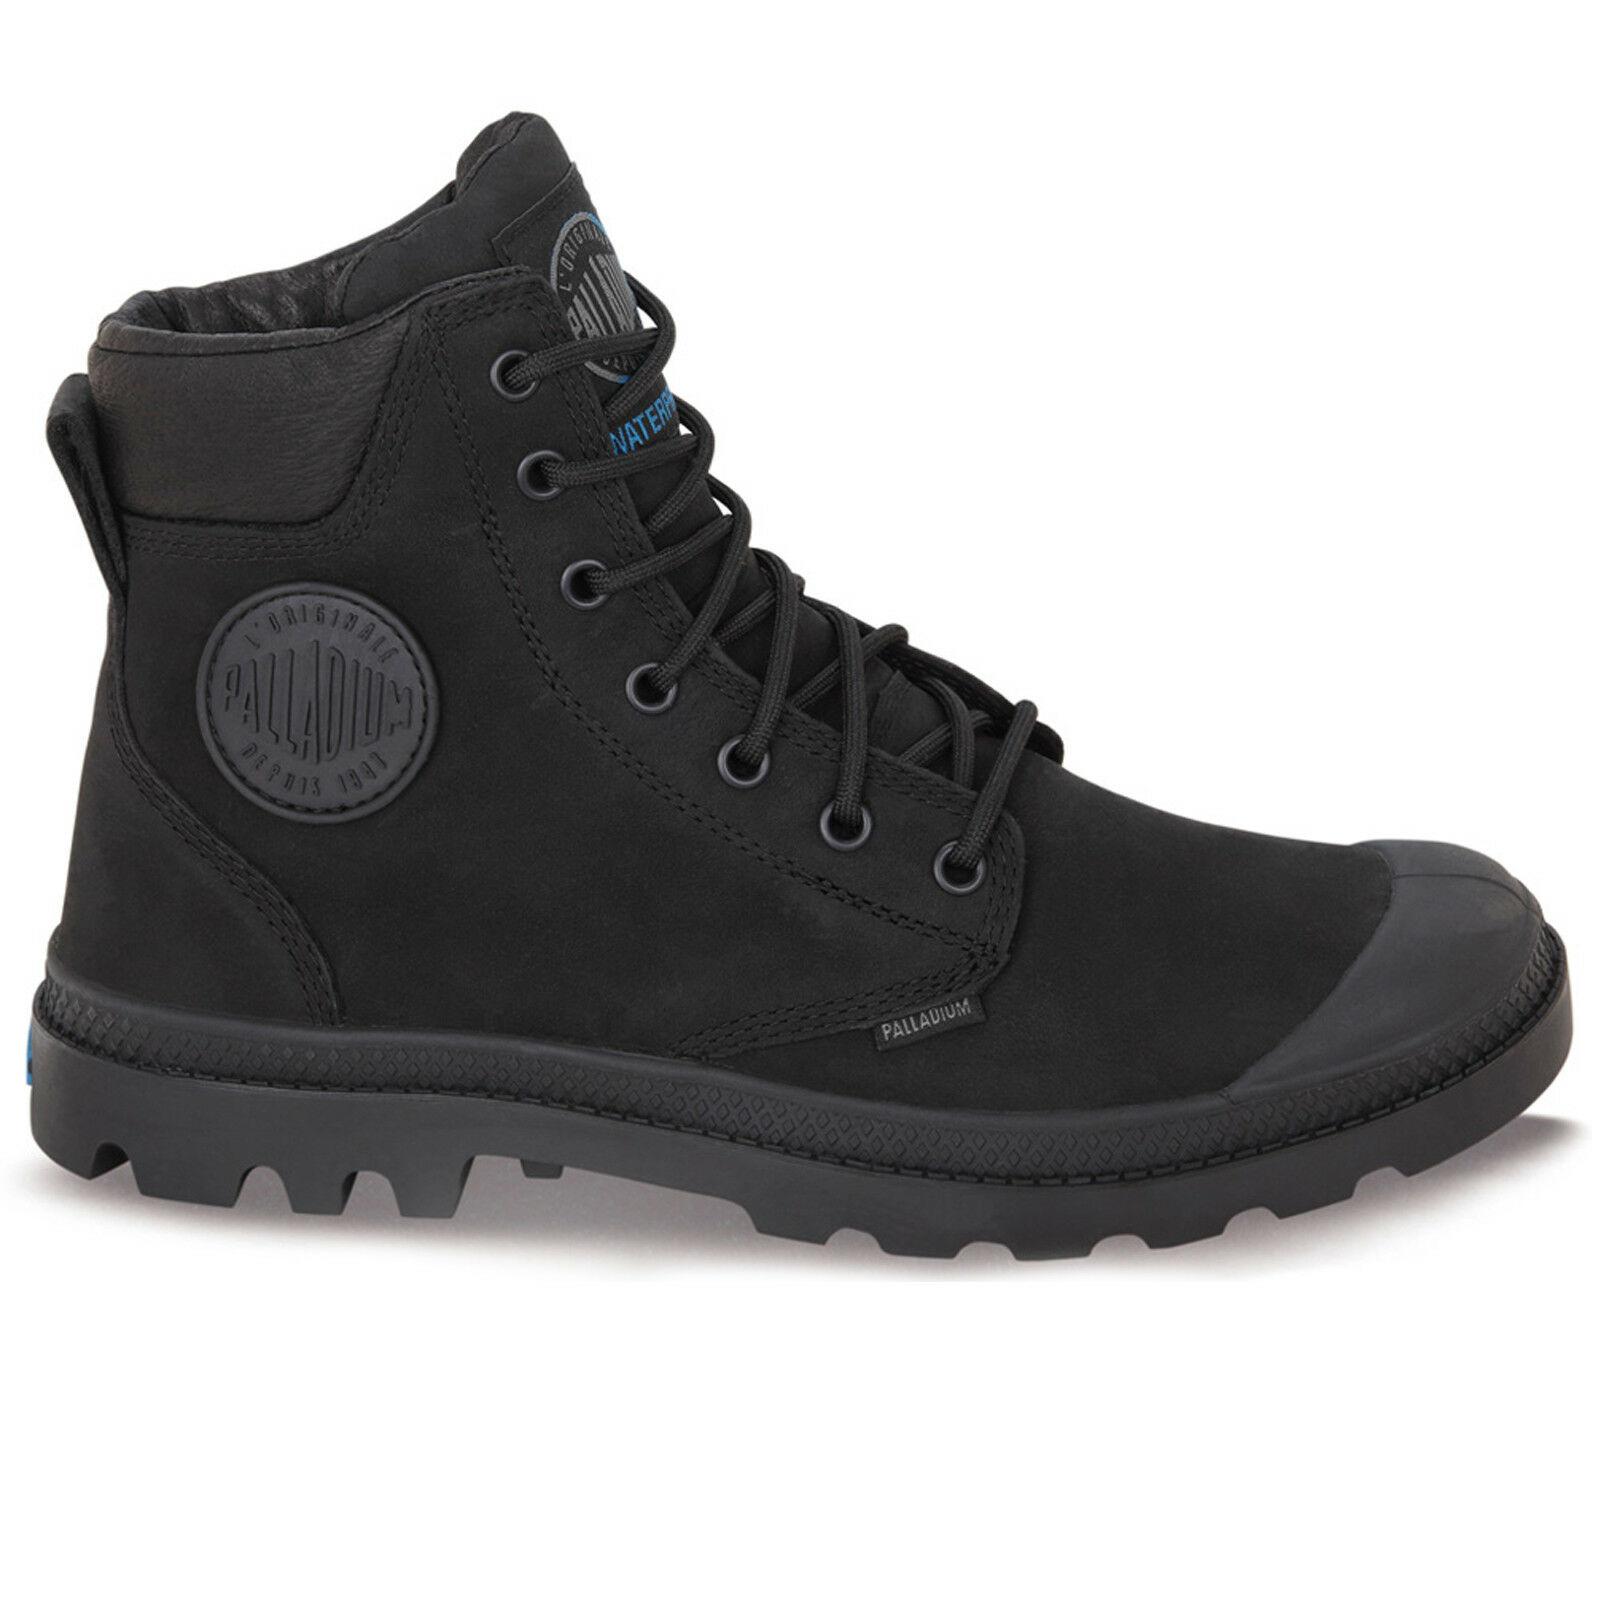 thumbnail 3 - Palladium Mens Pampa Cuff Lux Designer Waterproof Leather Walking Boots Shoes